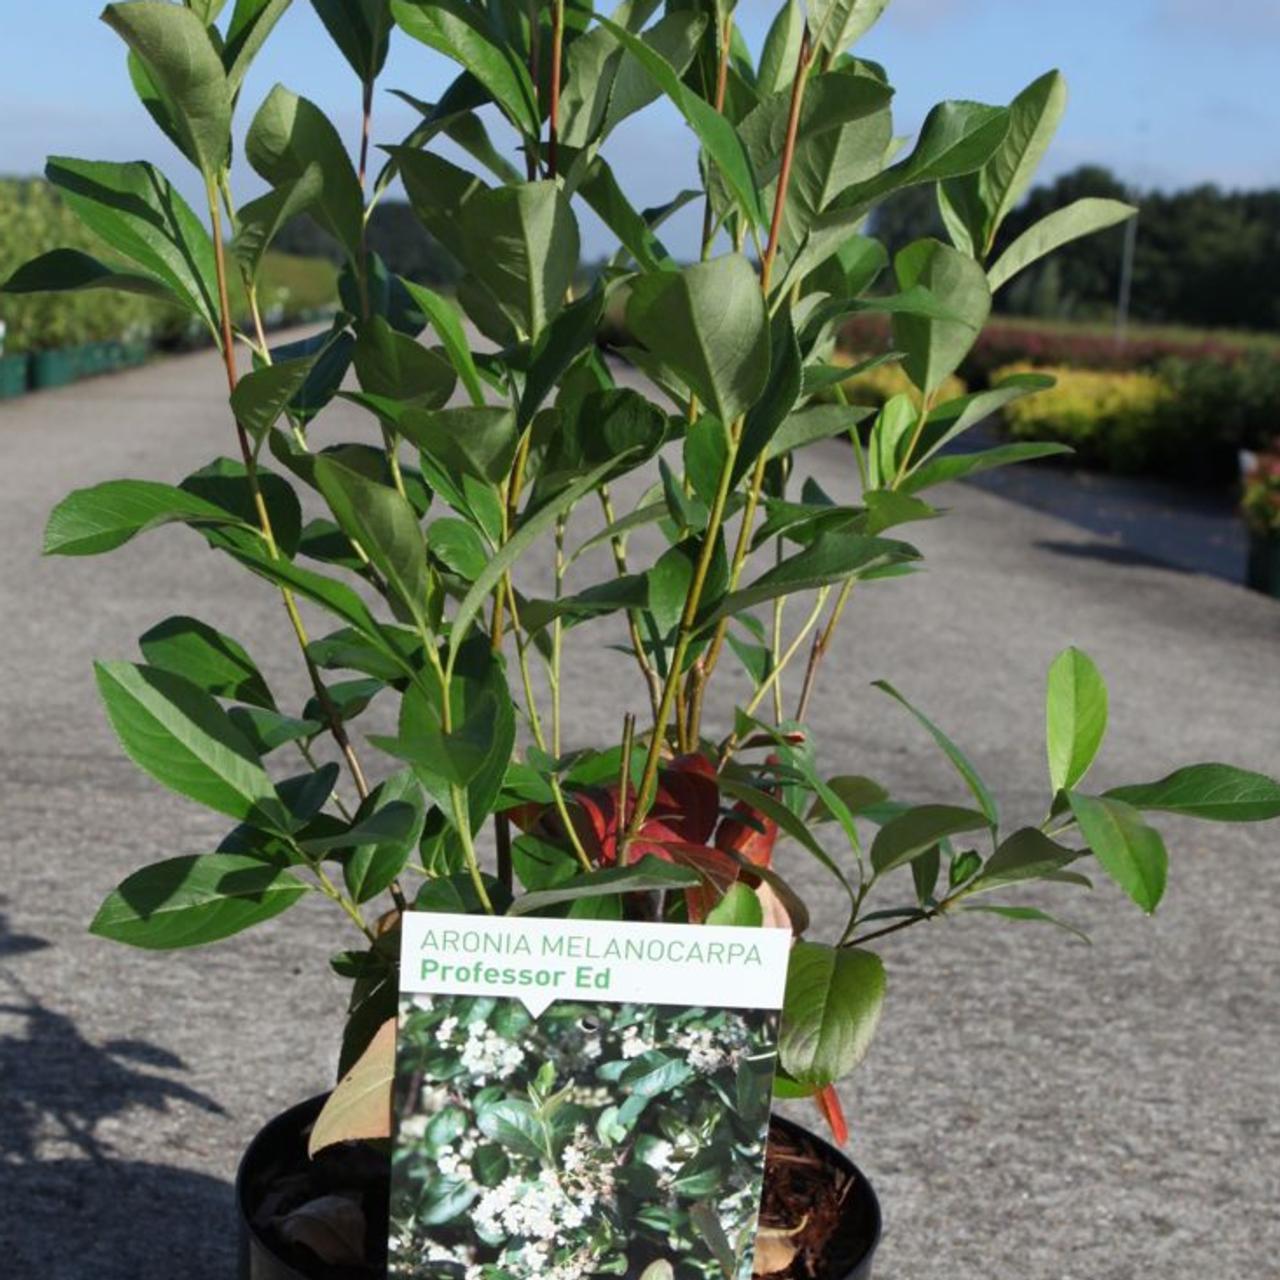 Aronia melanocarpa 'Professor Ed' plant